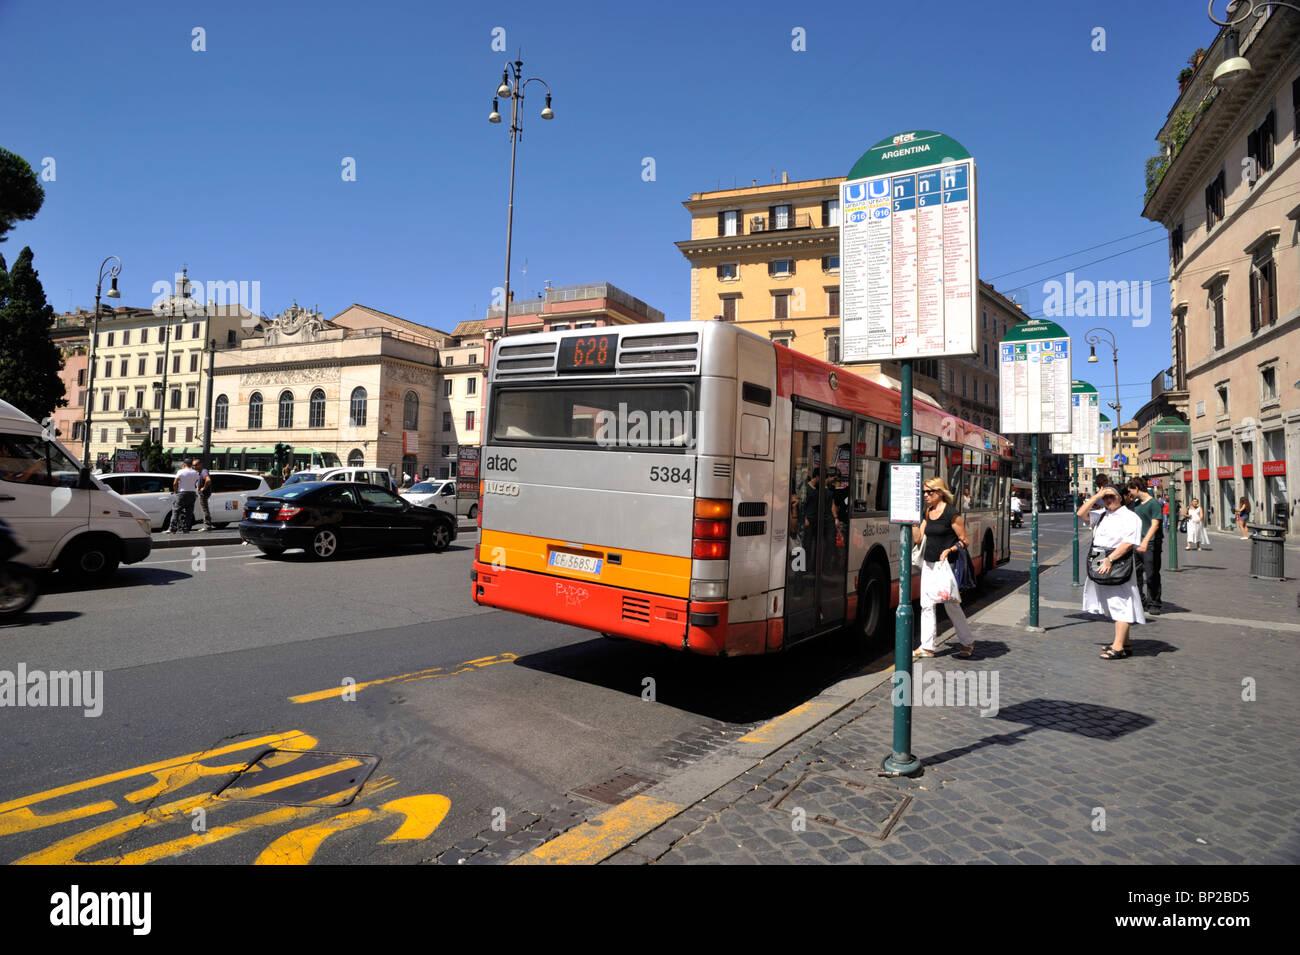 italy, rome, bus stop Stock Photo - Alamy